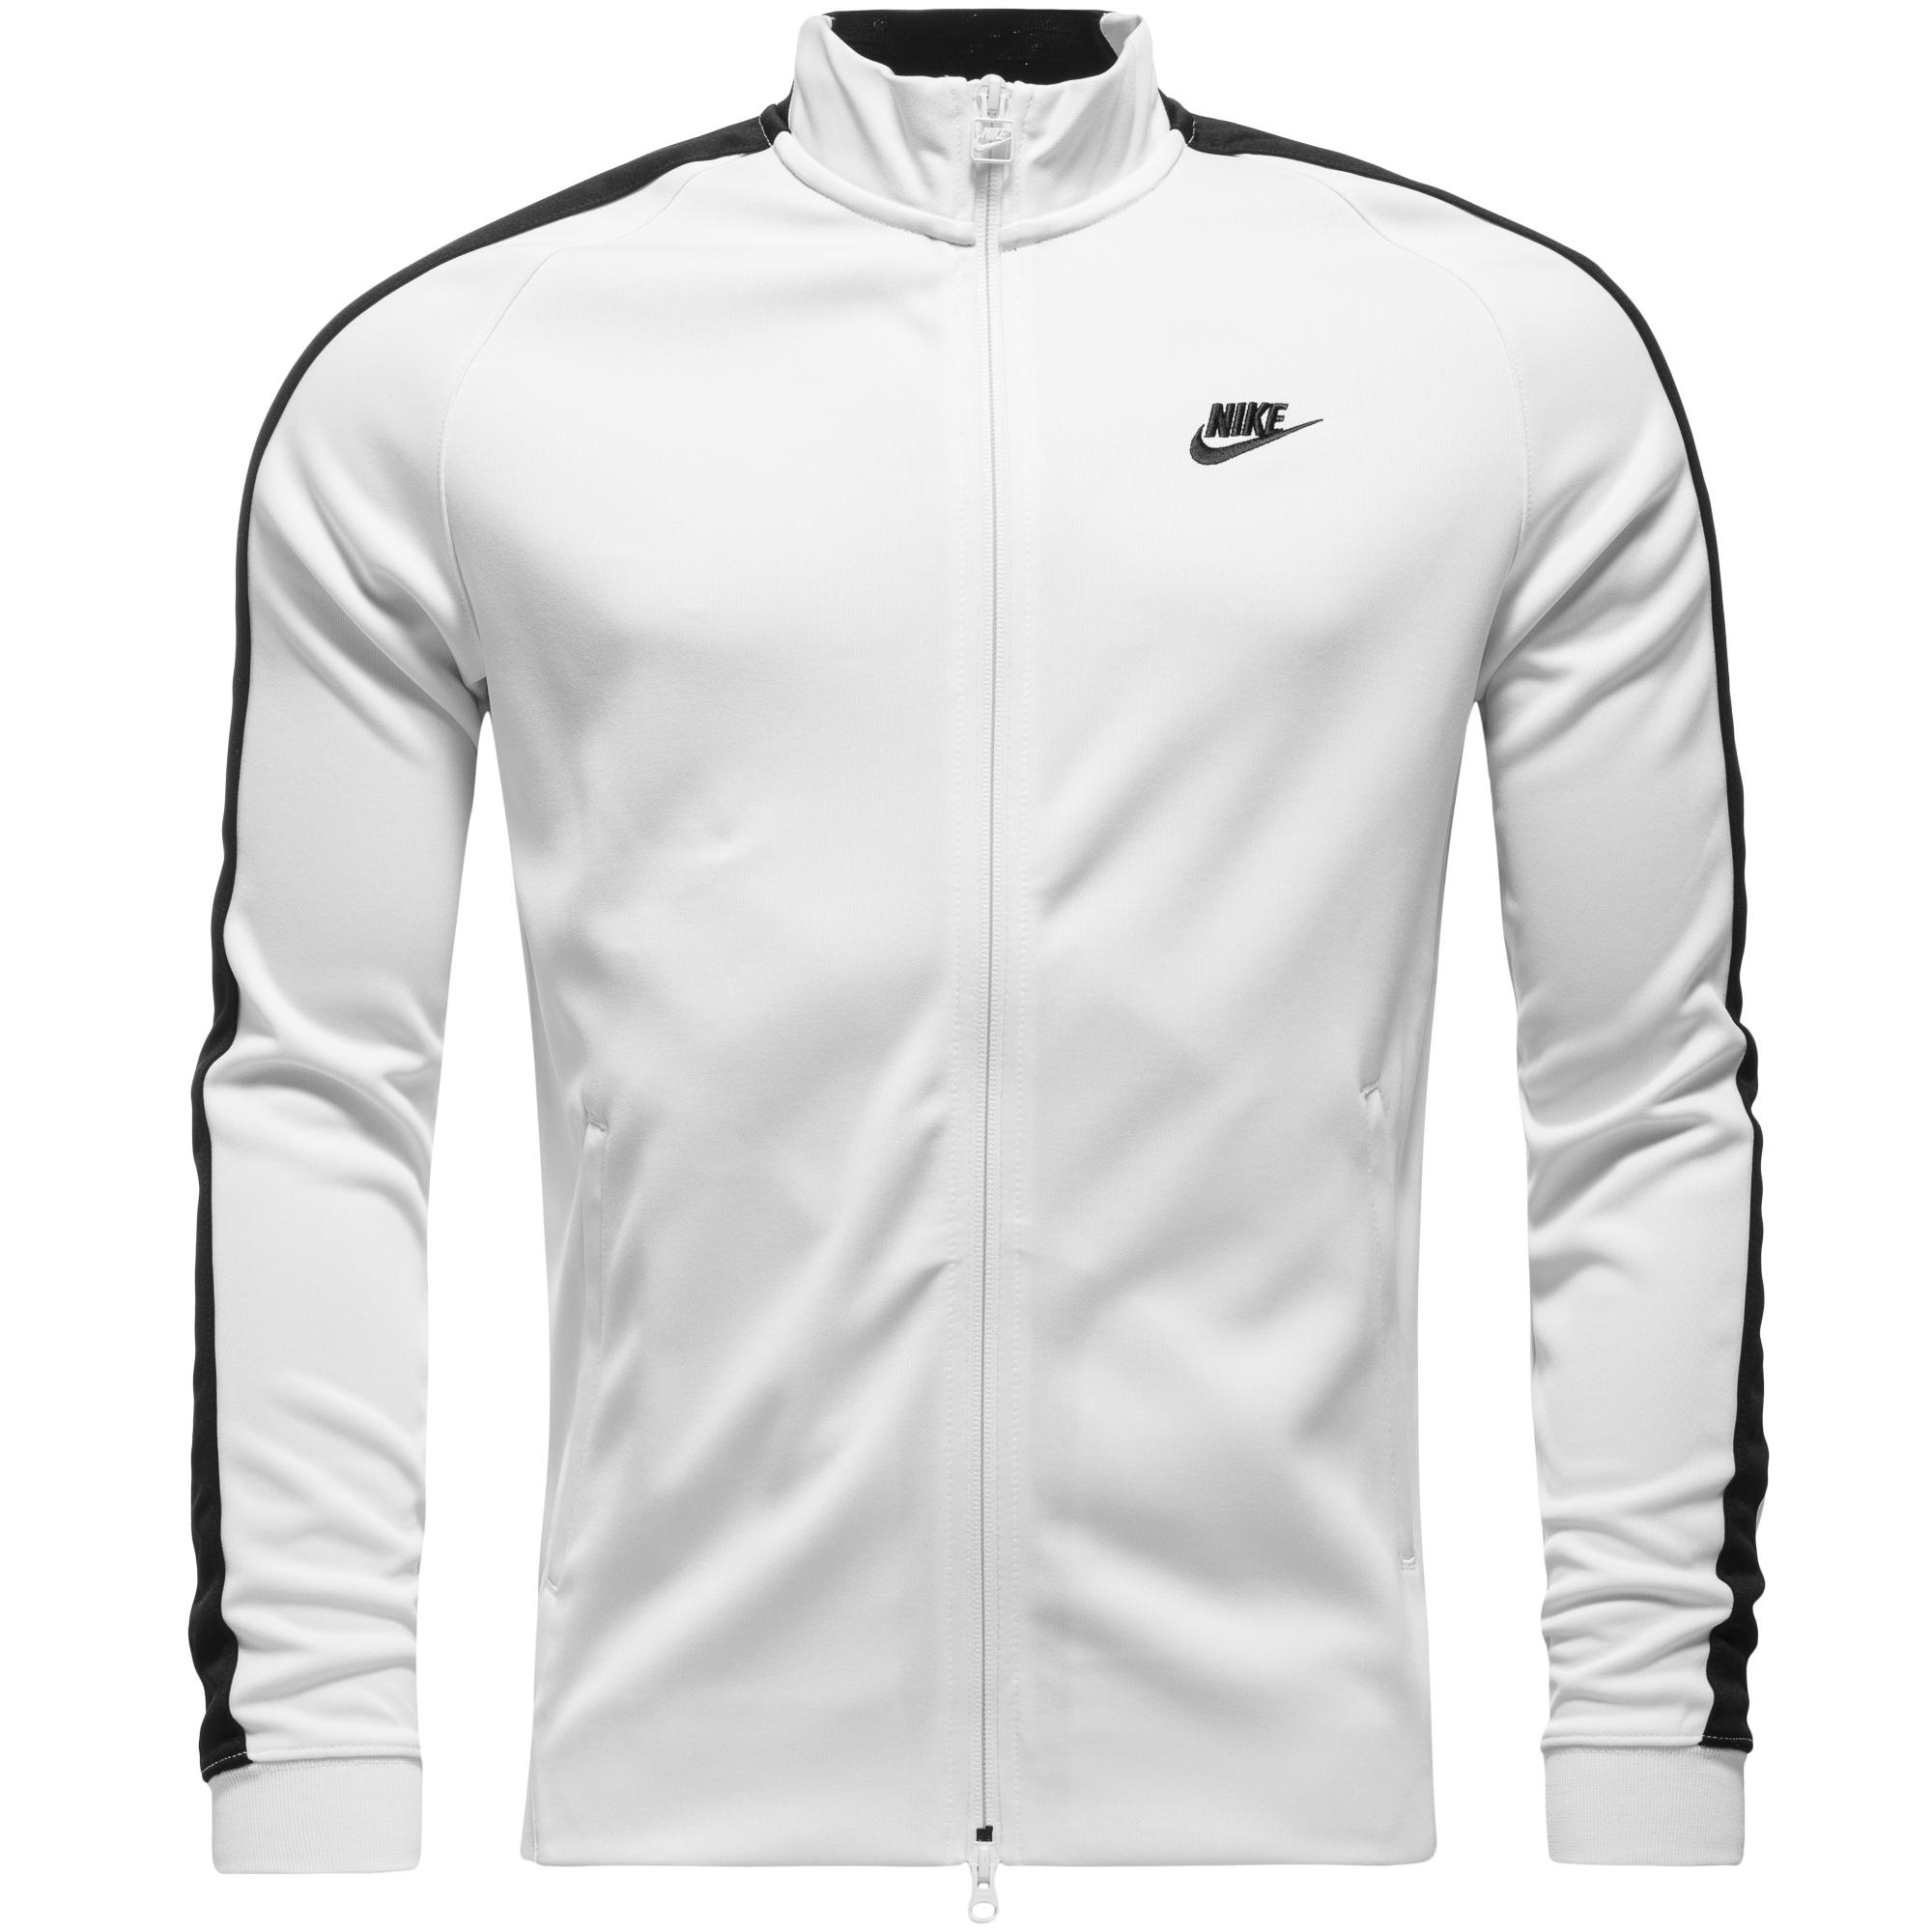 Nike F.C. Track Top N98 Vit/Svart